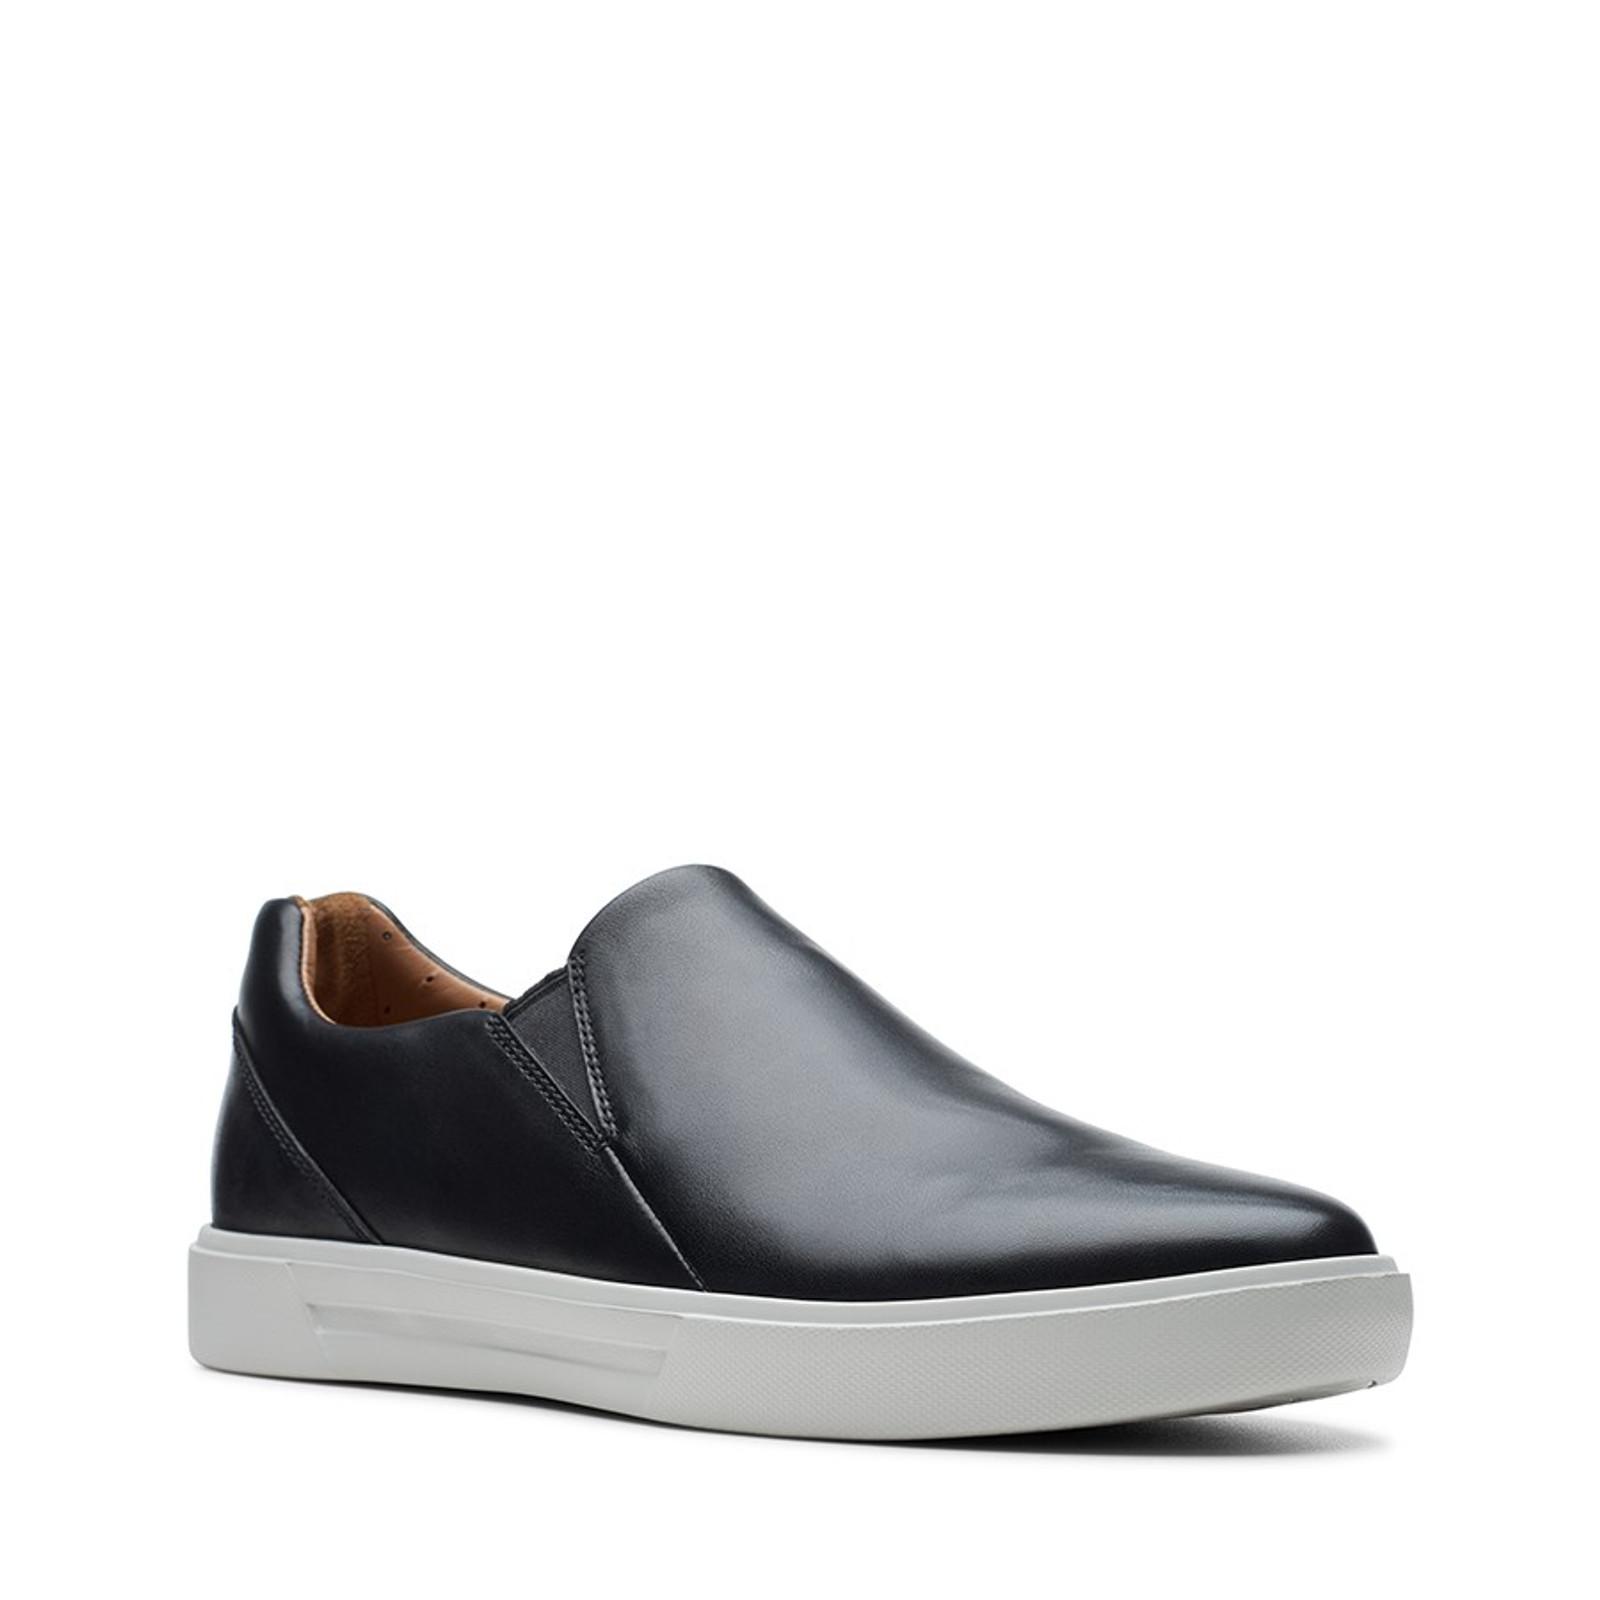 Clarks Mens UN COSTA STEP Black Leather